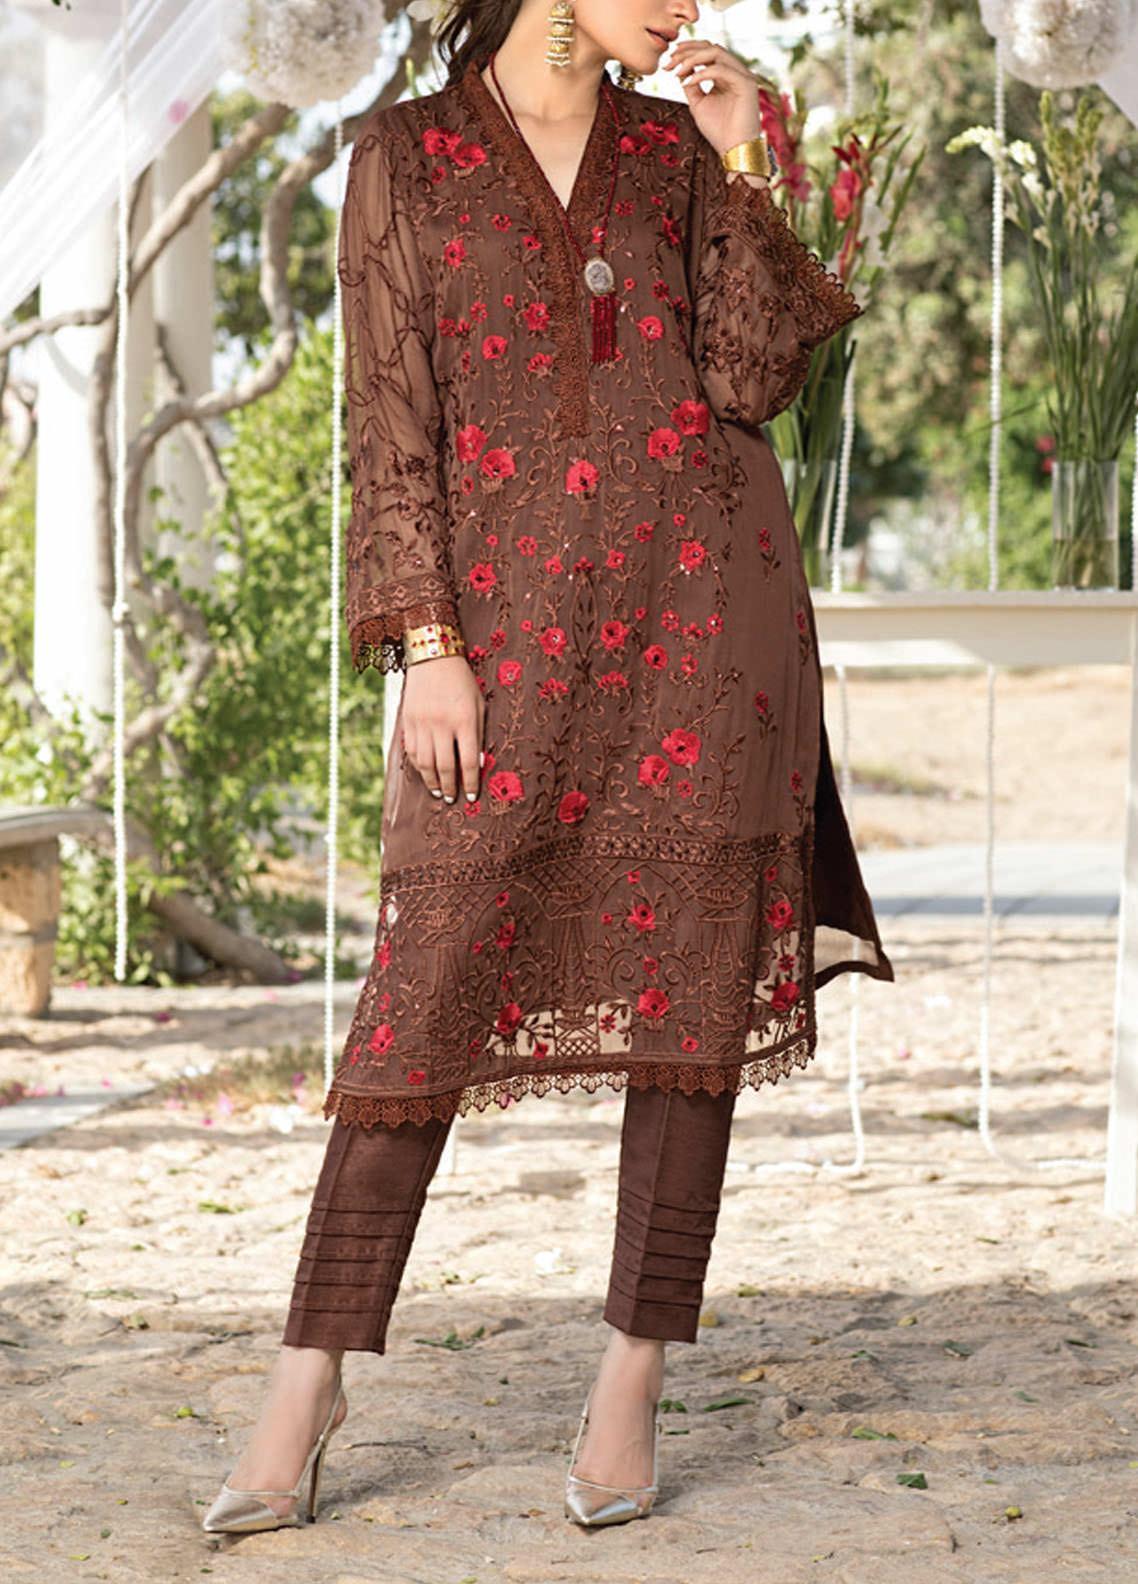 Azure Embroidered Chiffon Unstitched Kurties AZU20-LF3 04 Autumn Breeze - Luxury Formal Collection